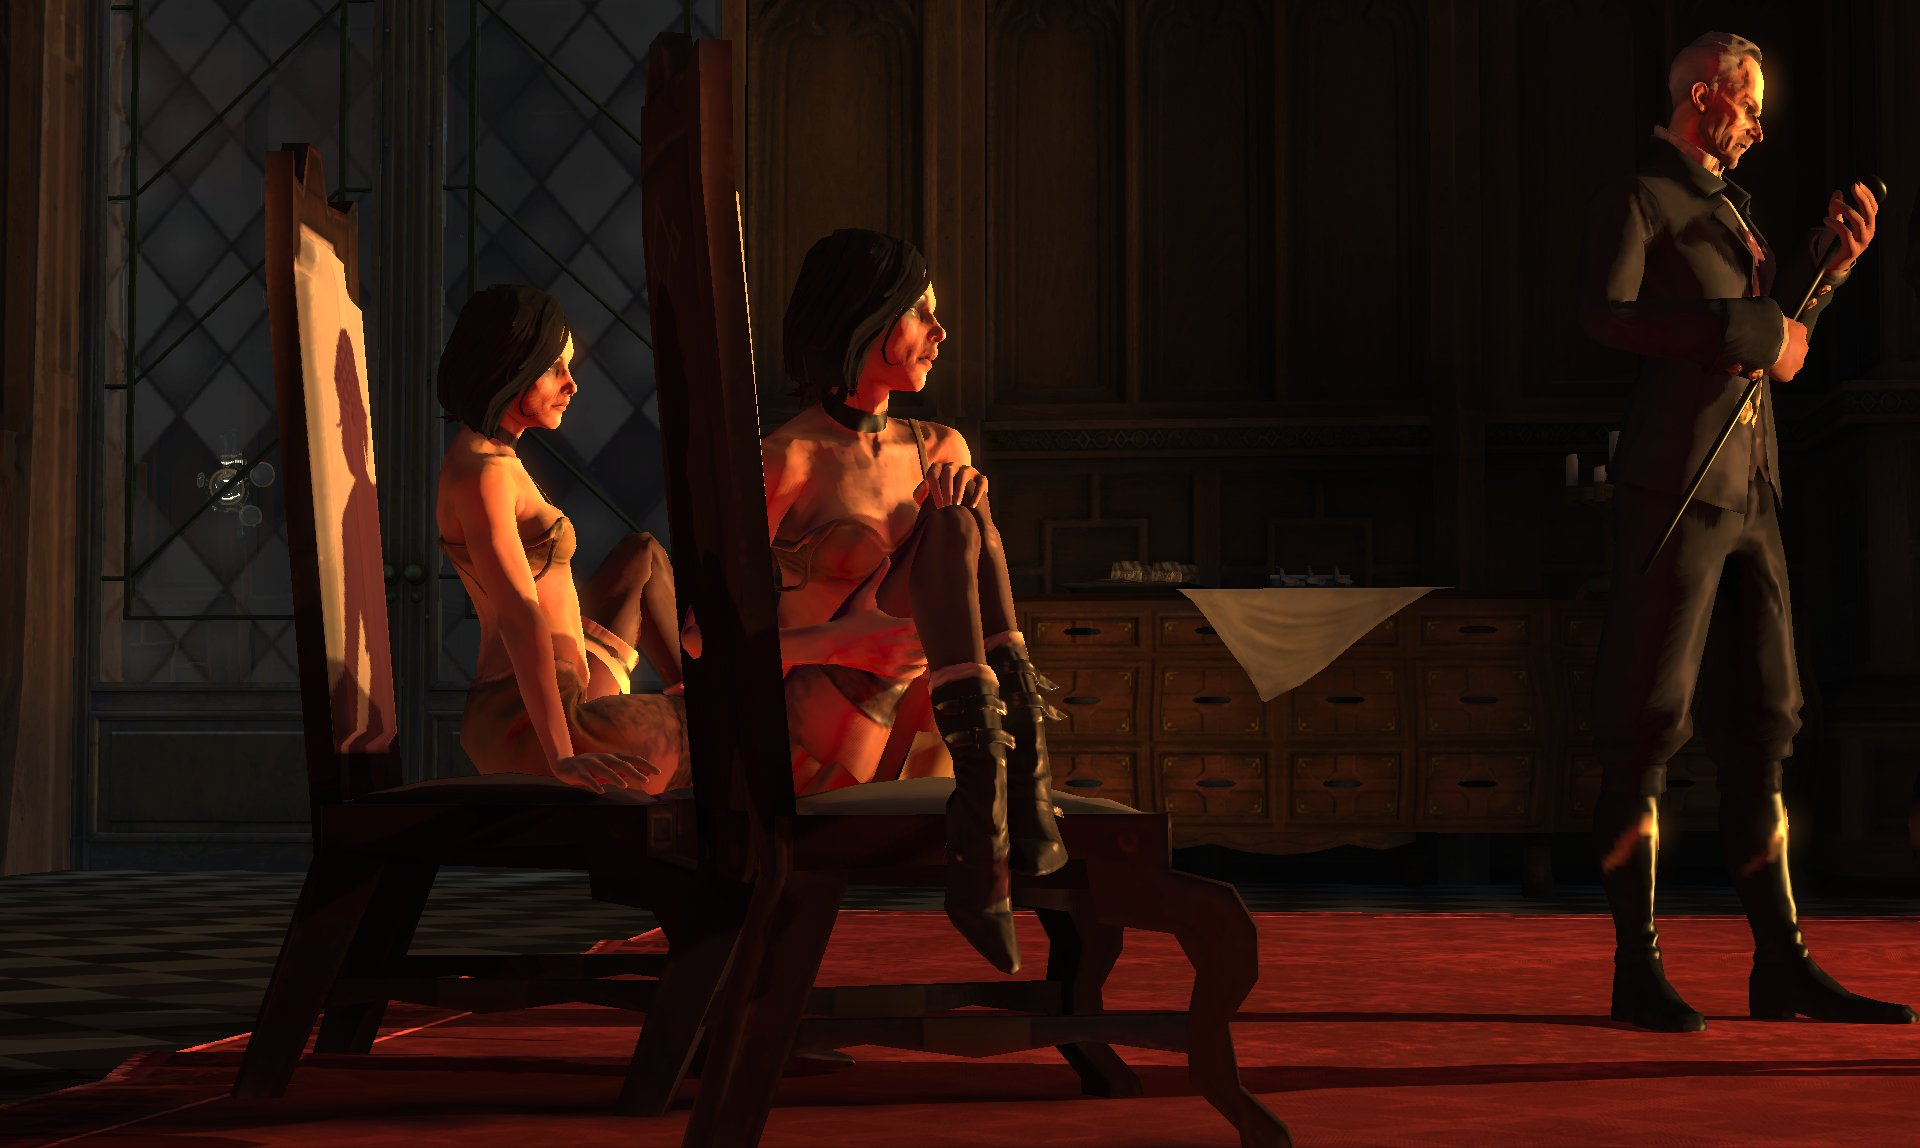 Image - Aristocrat and courtesan.jpg | Dishonored Wiki | FANDOM ...